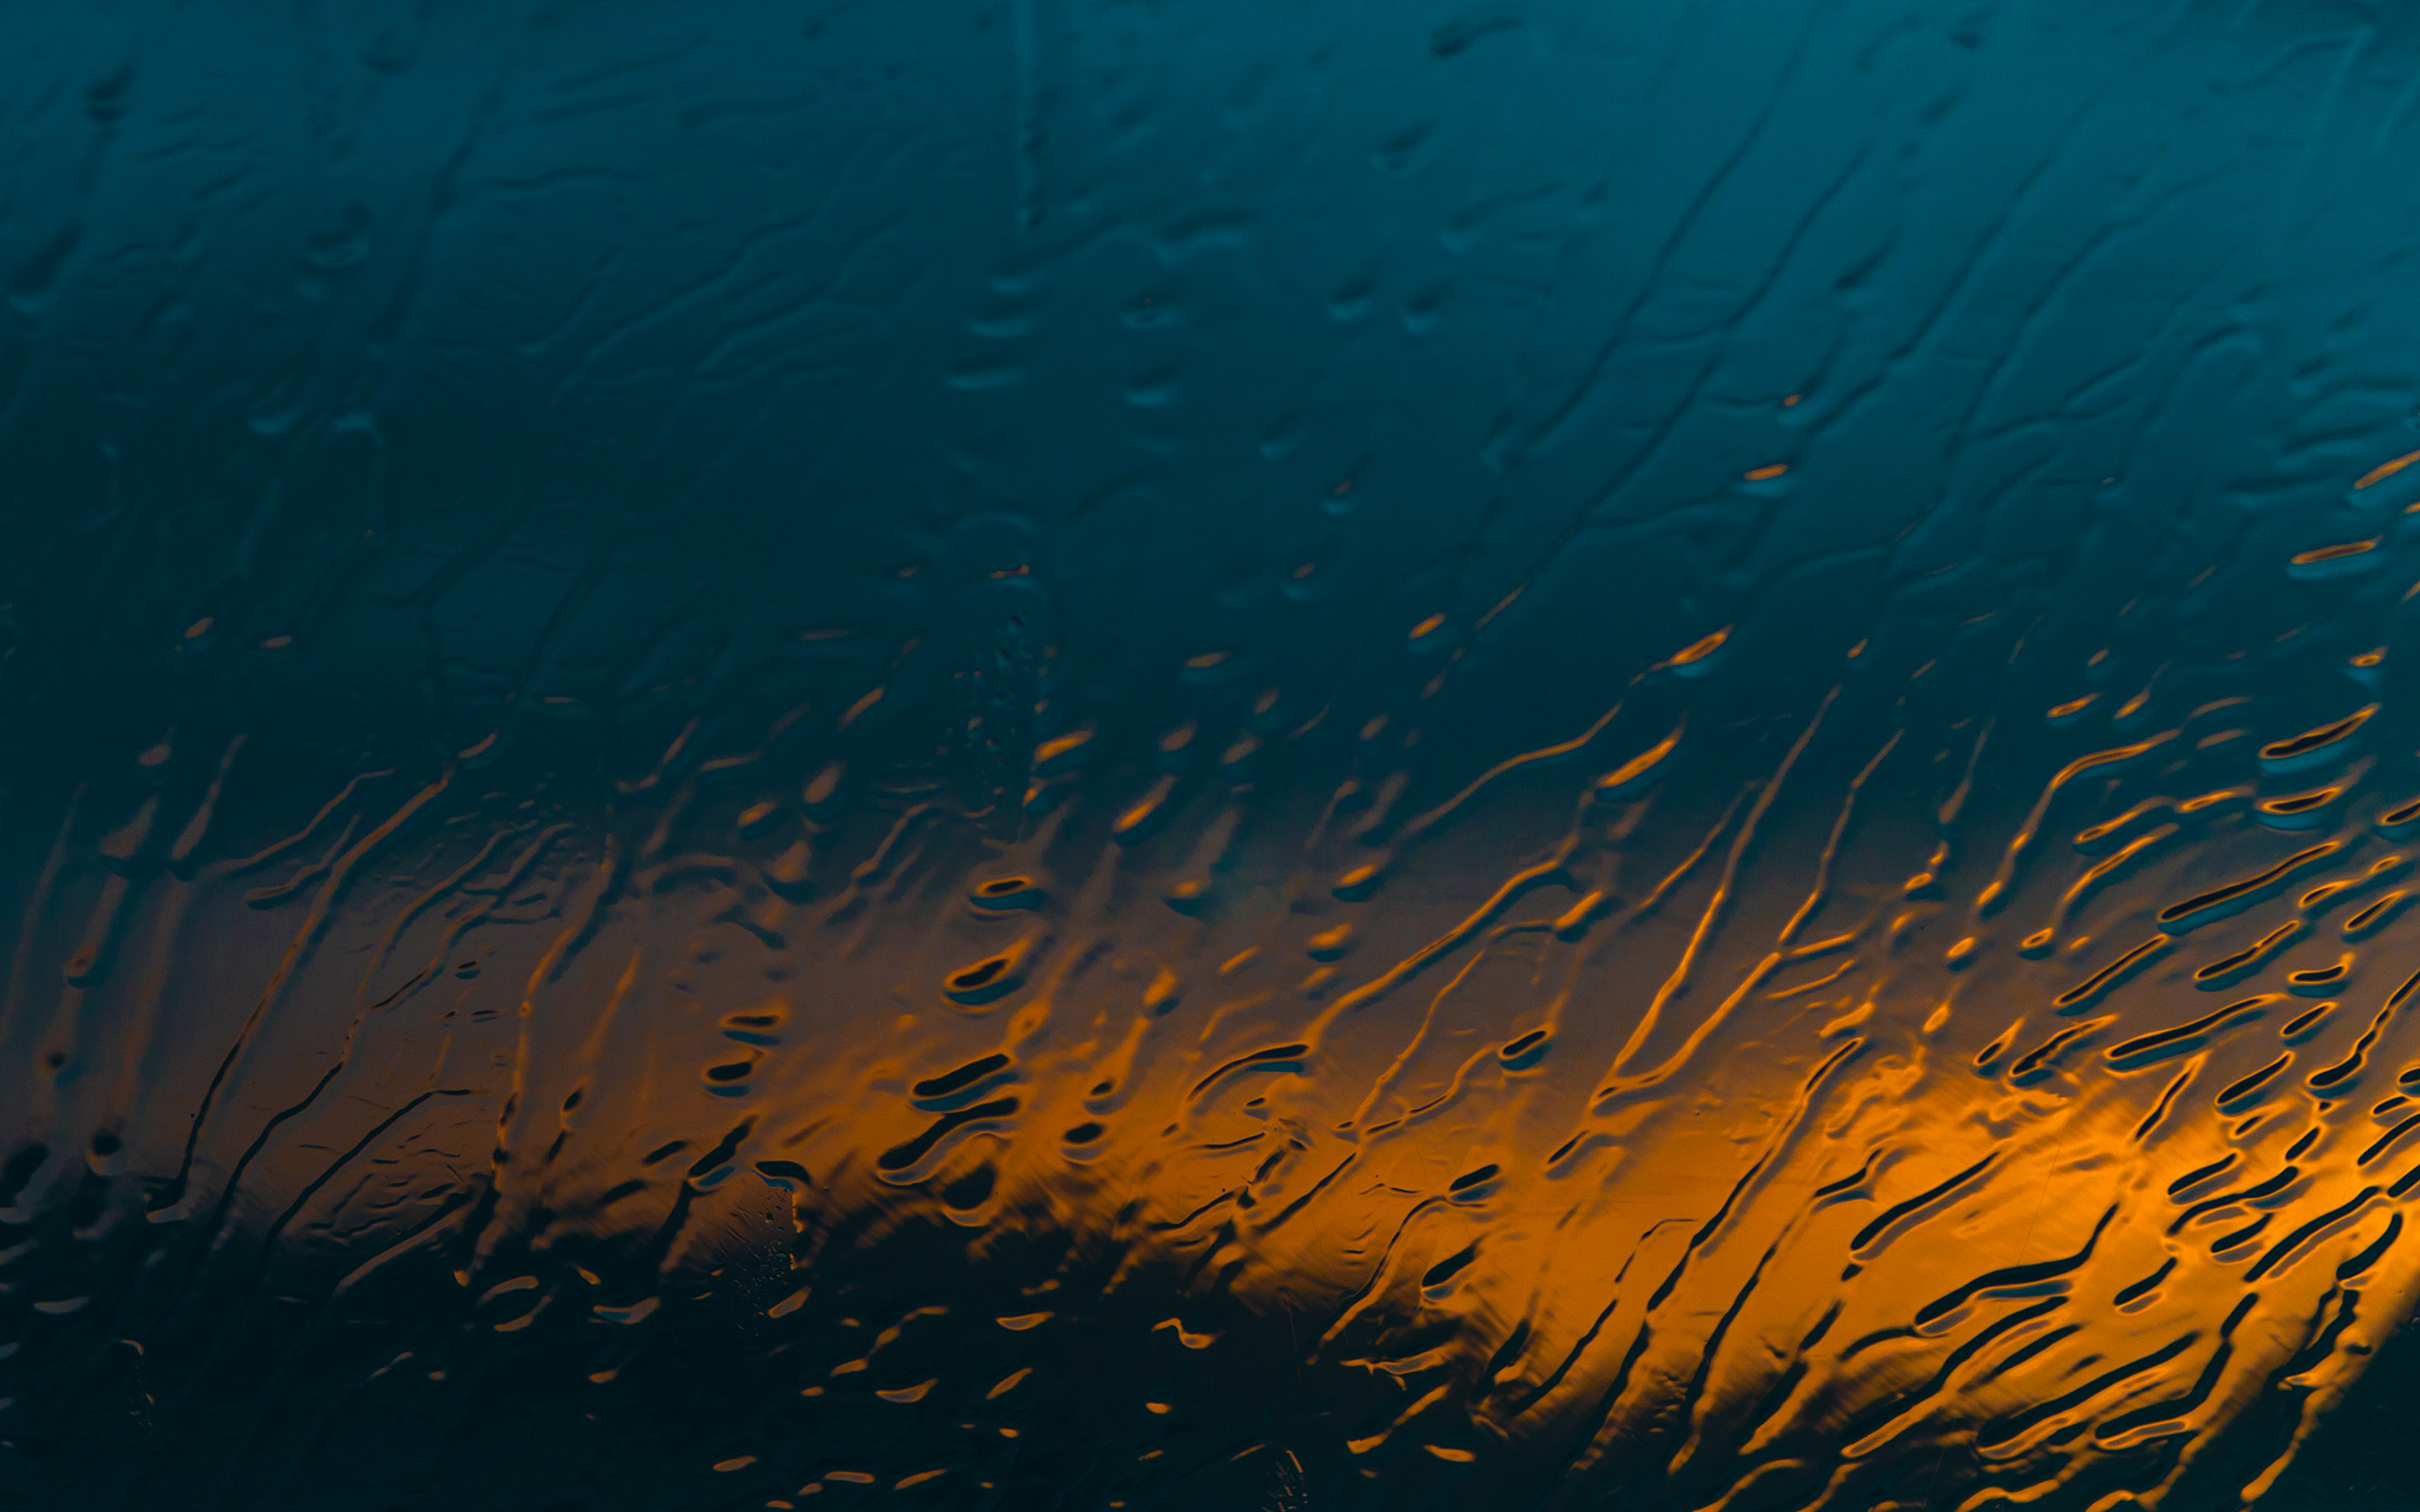 Amazing Wallpaper Macbook Rain - papers  You Should Have_40253.jpg